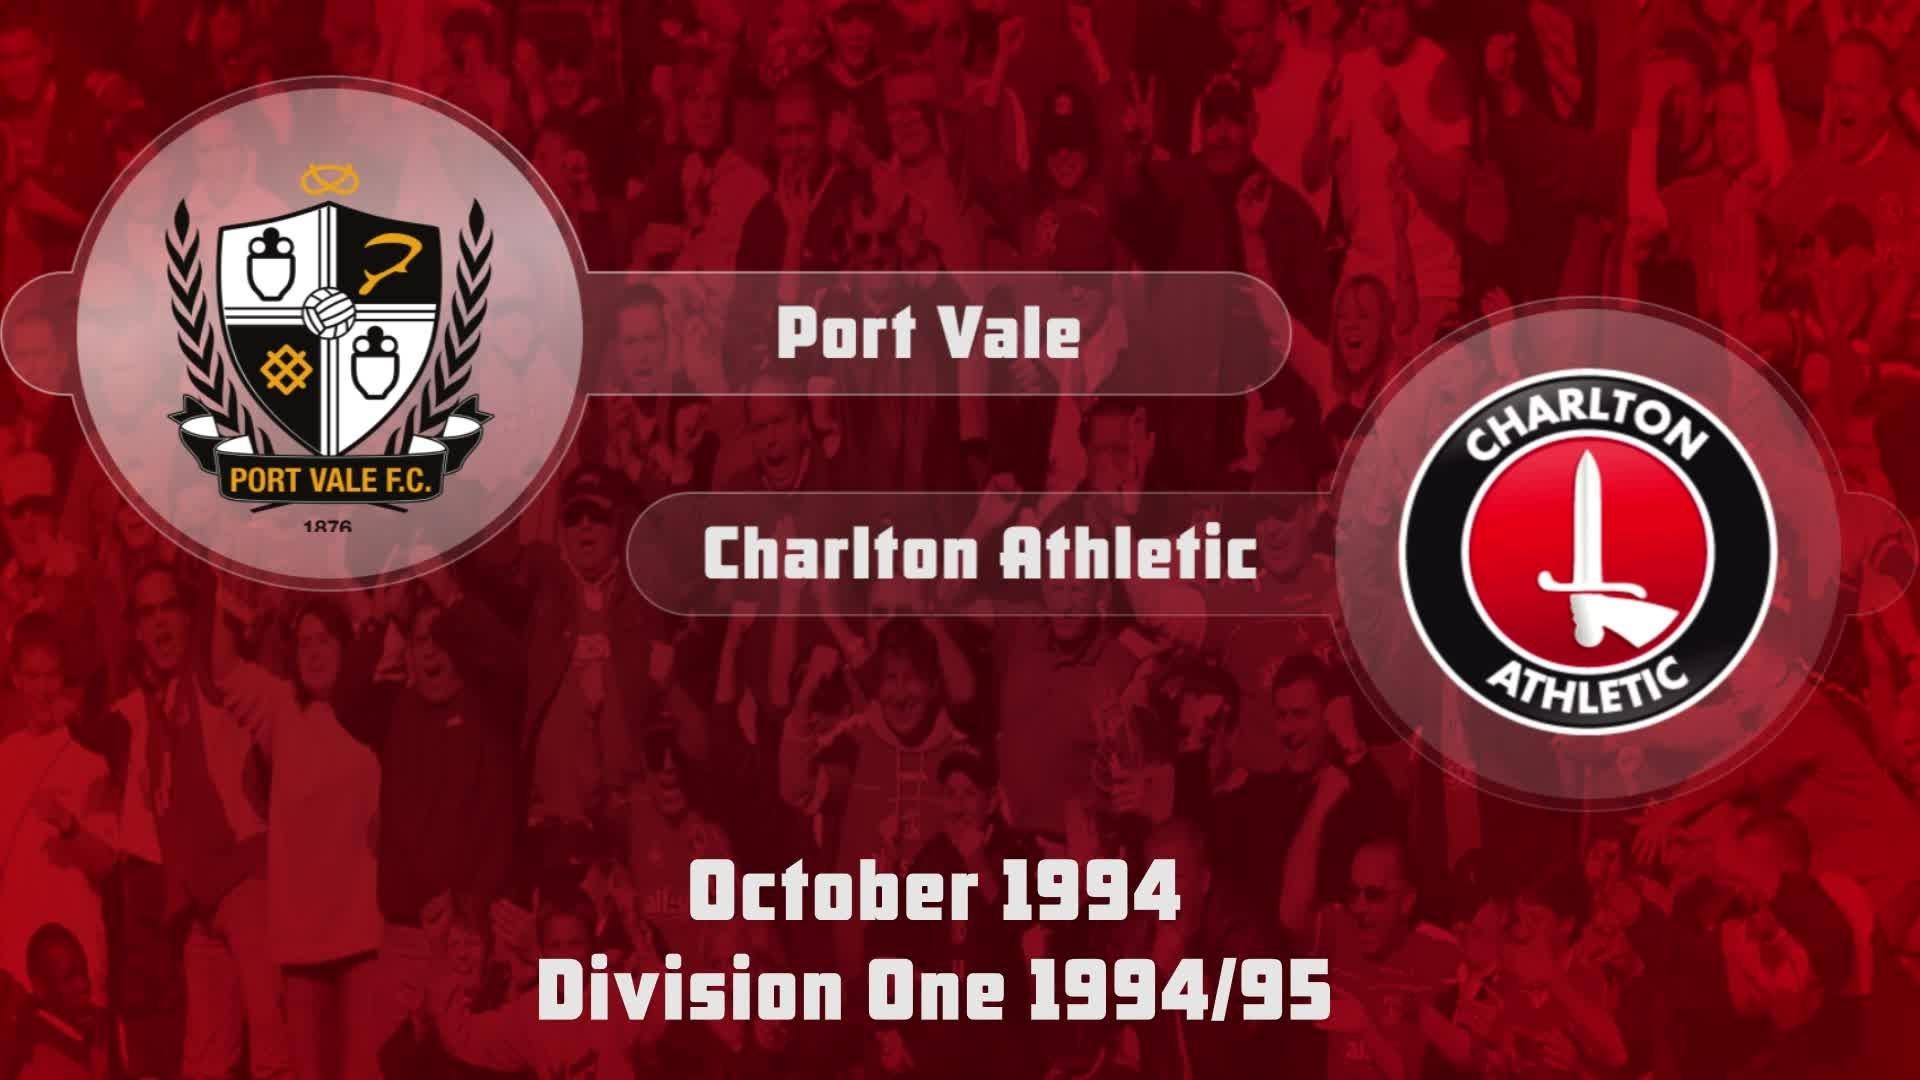 14 HIGHLIGHTS | Port Vale 0 Charlton 2 (Oct 1994)